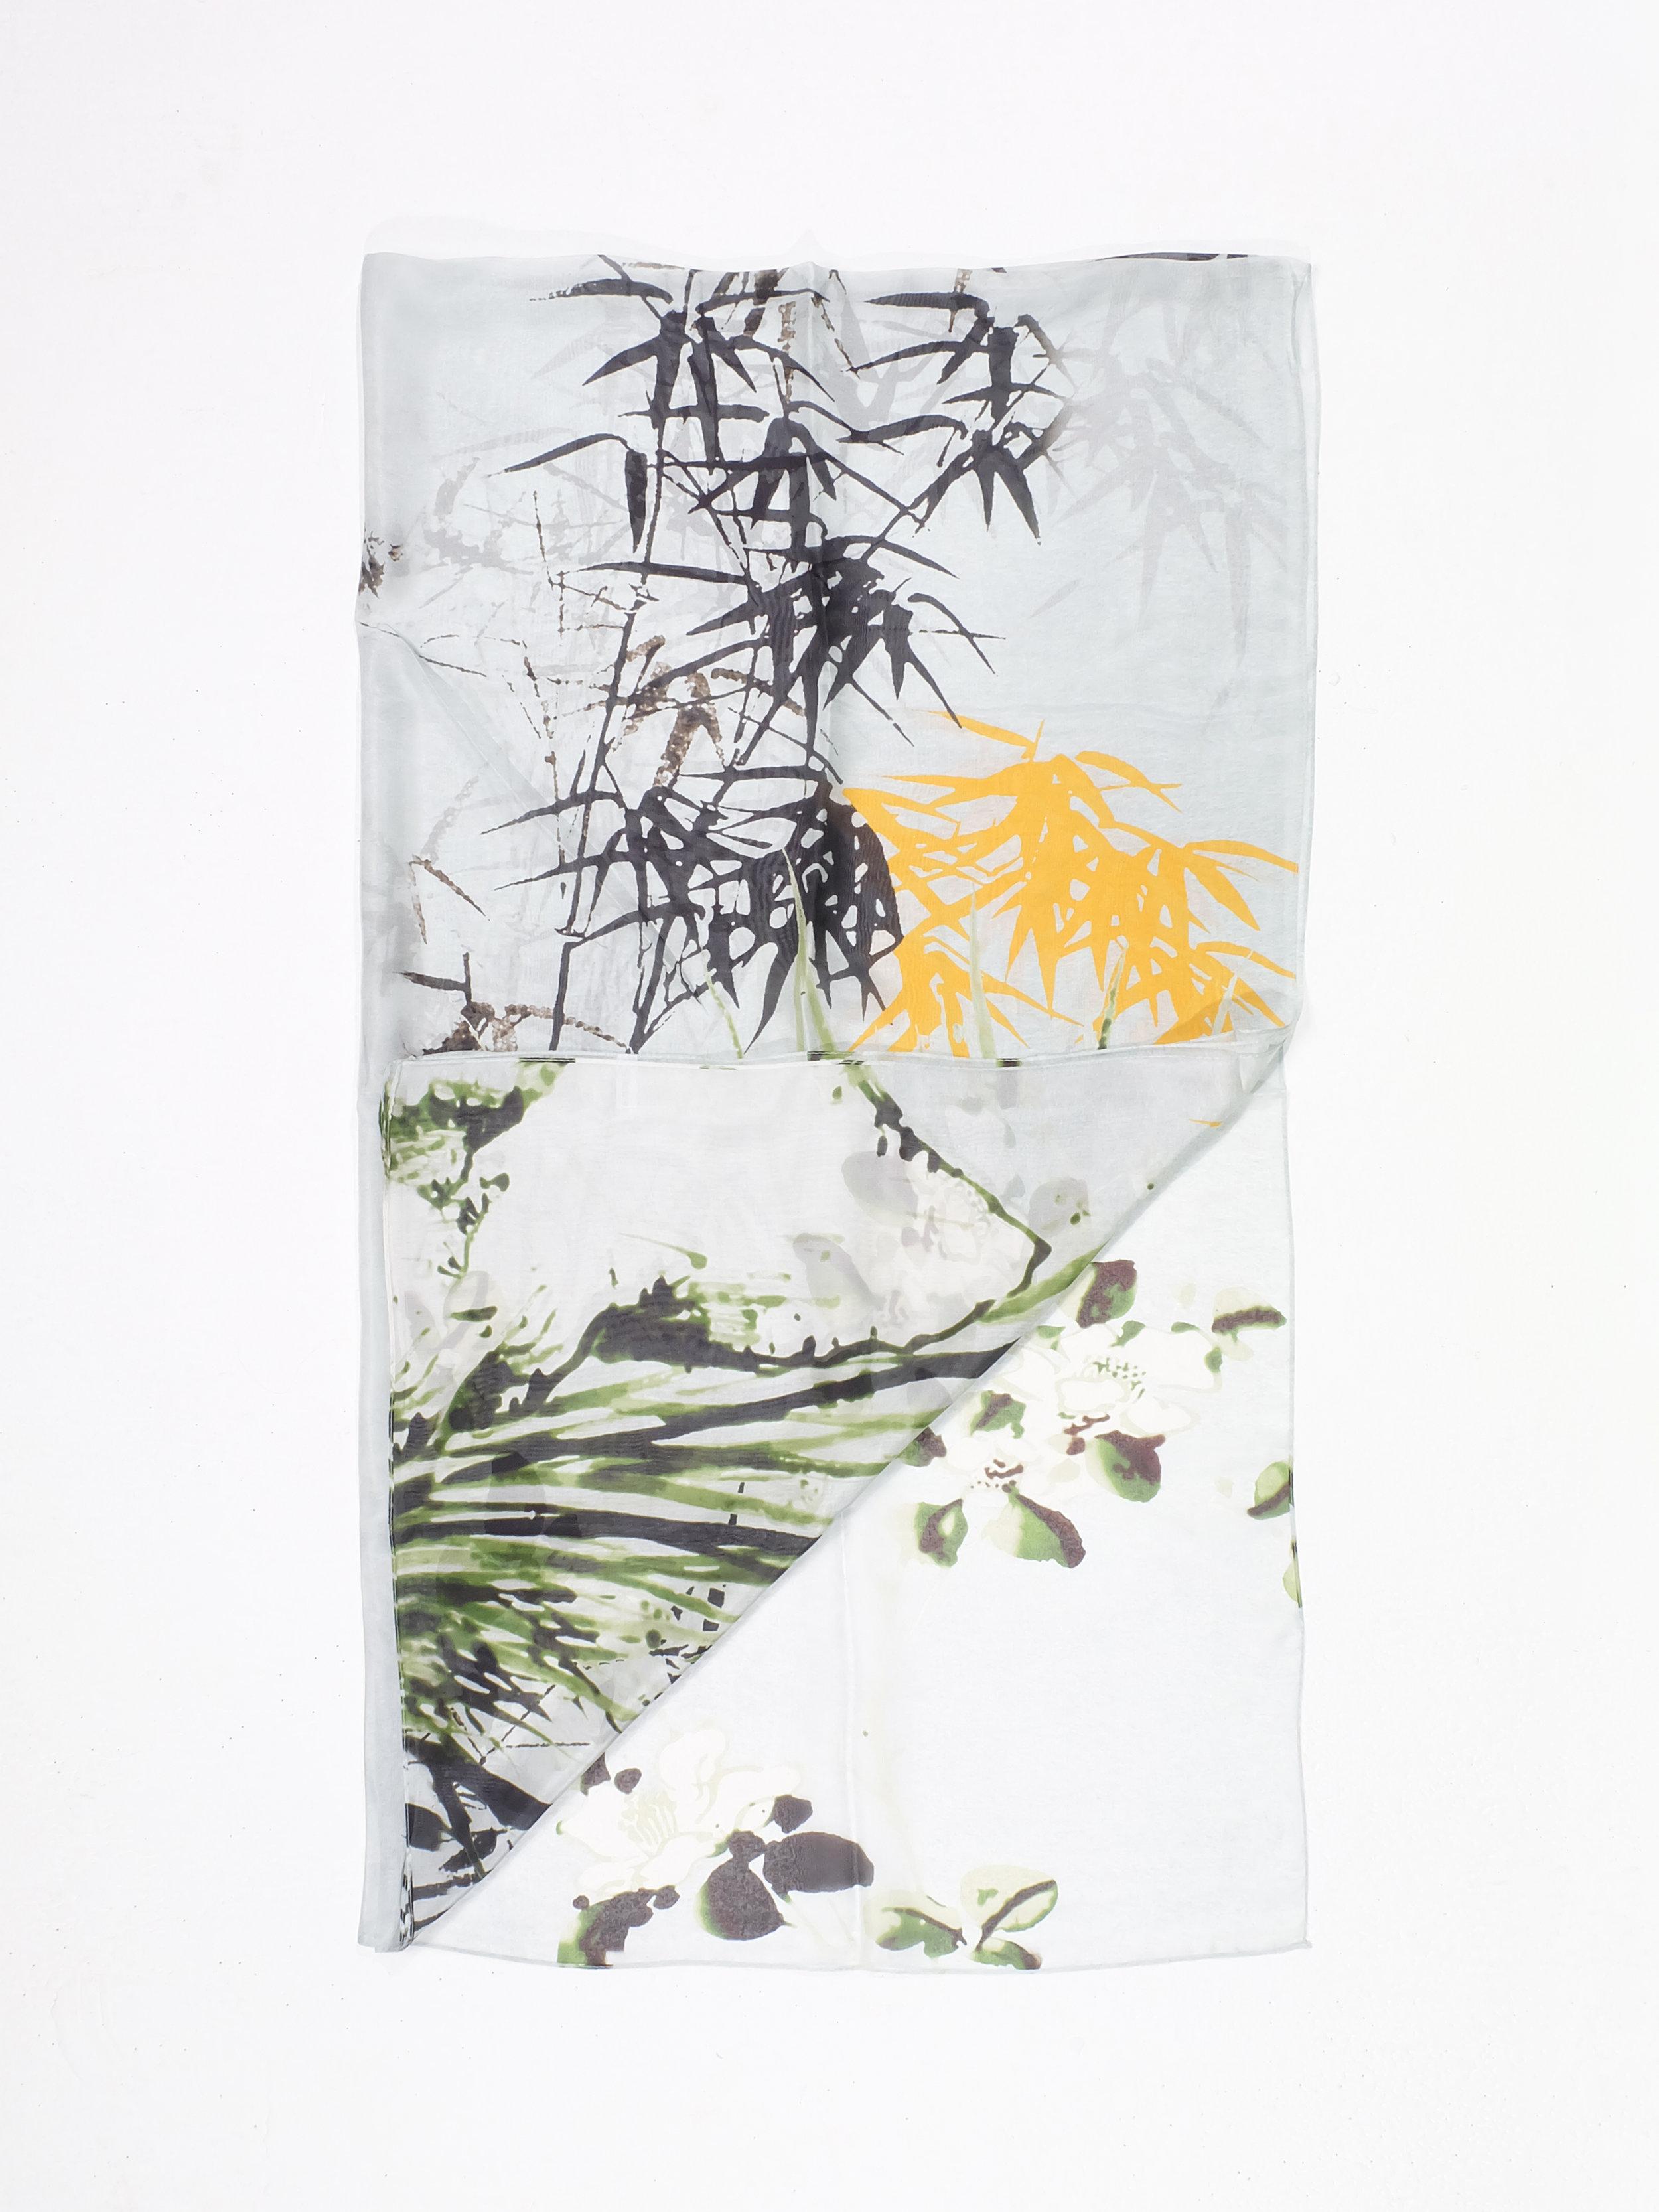 Dragonfly's Den (Yellow) - 196x112cm